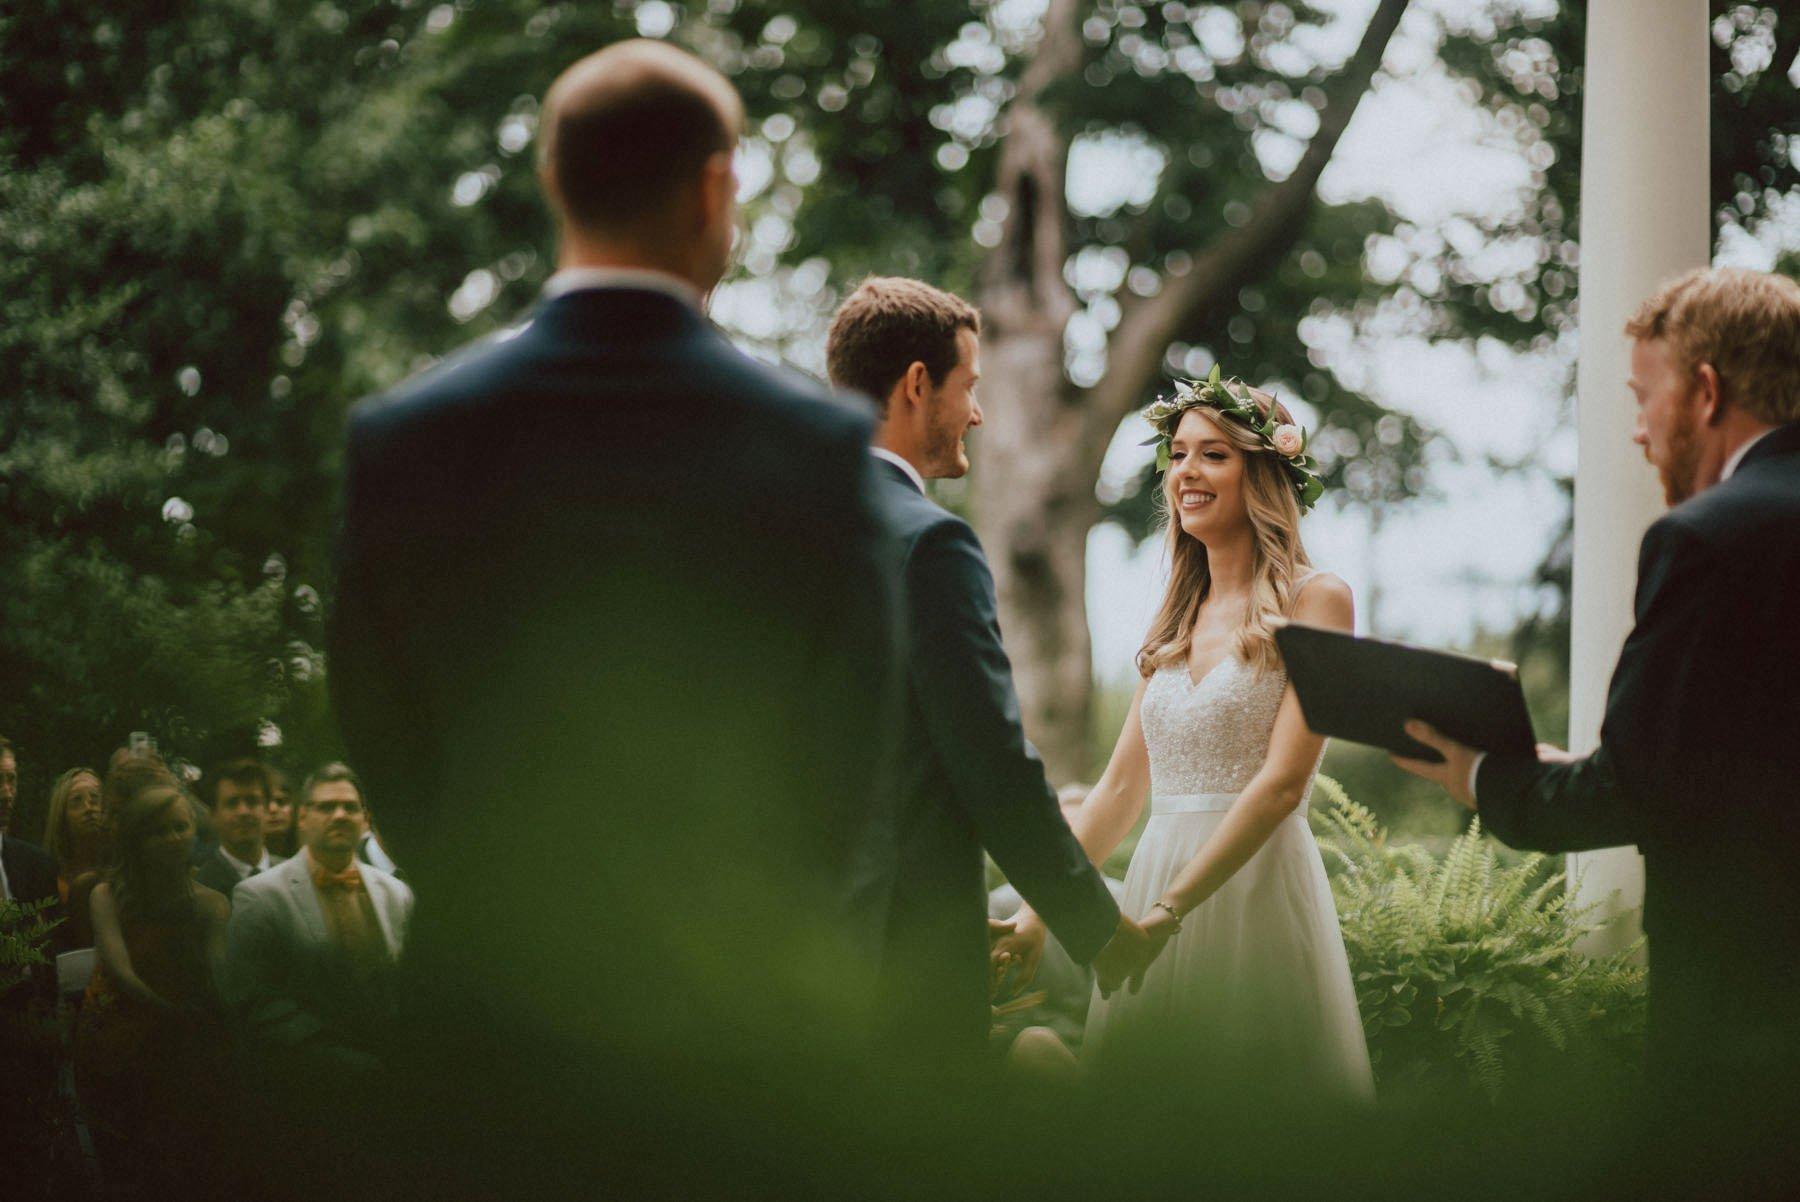 Knowlton-mansion-wedding-93.jpg